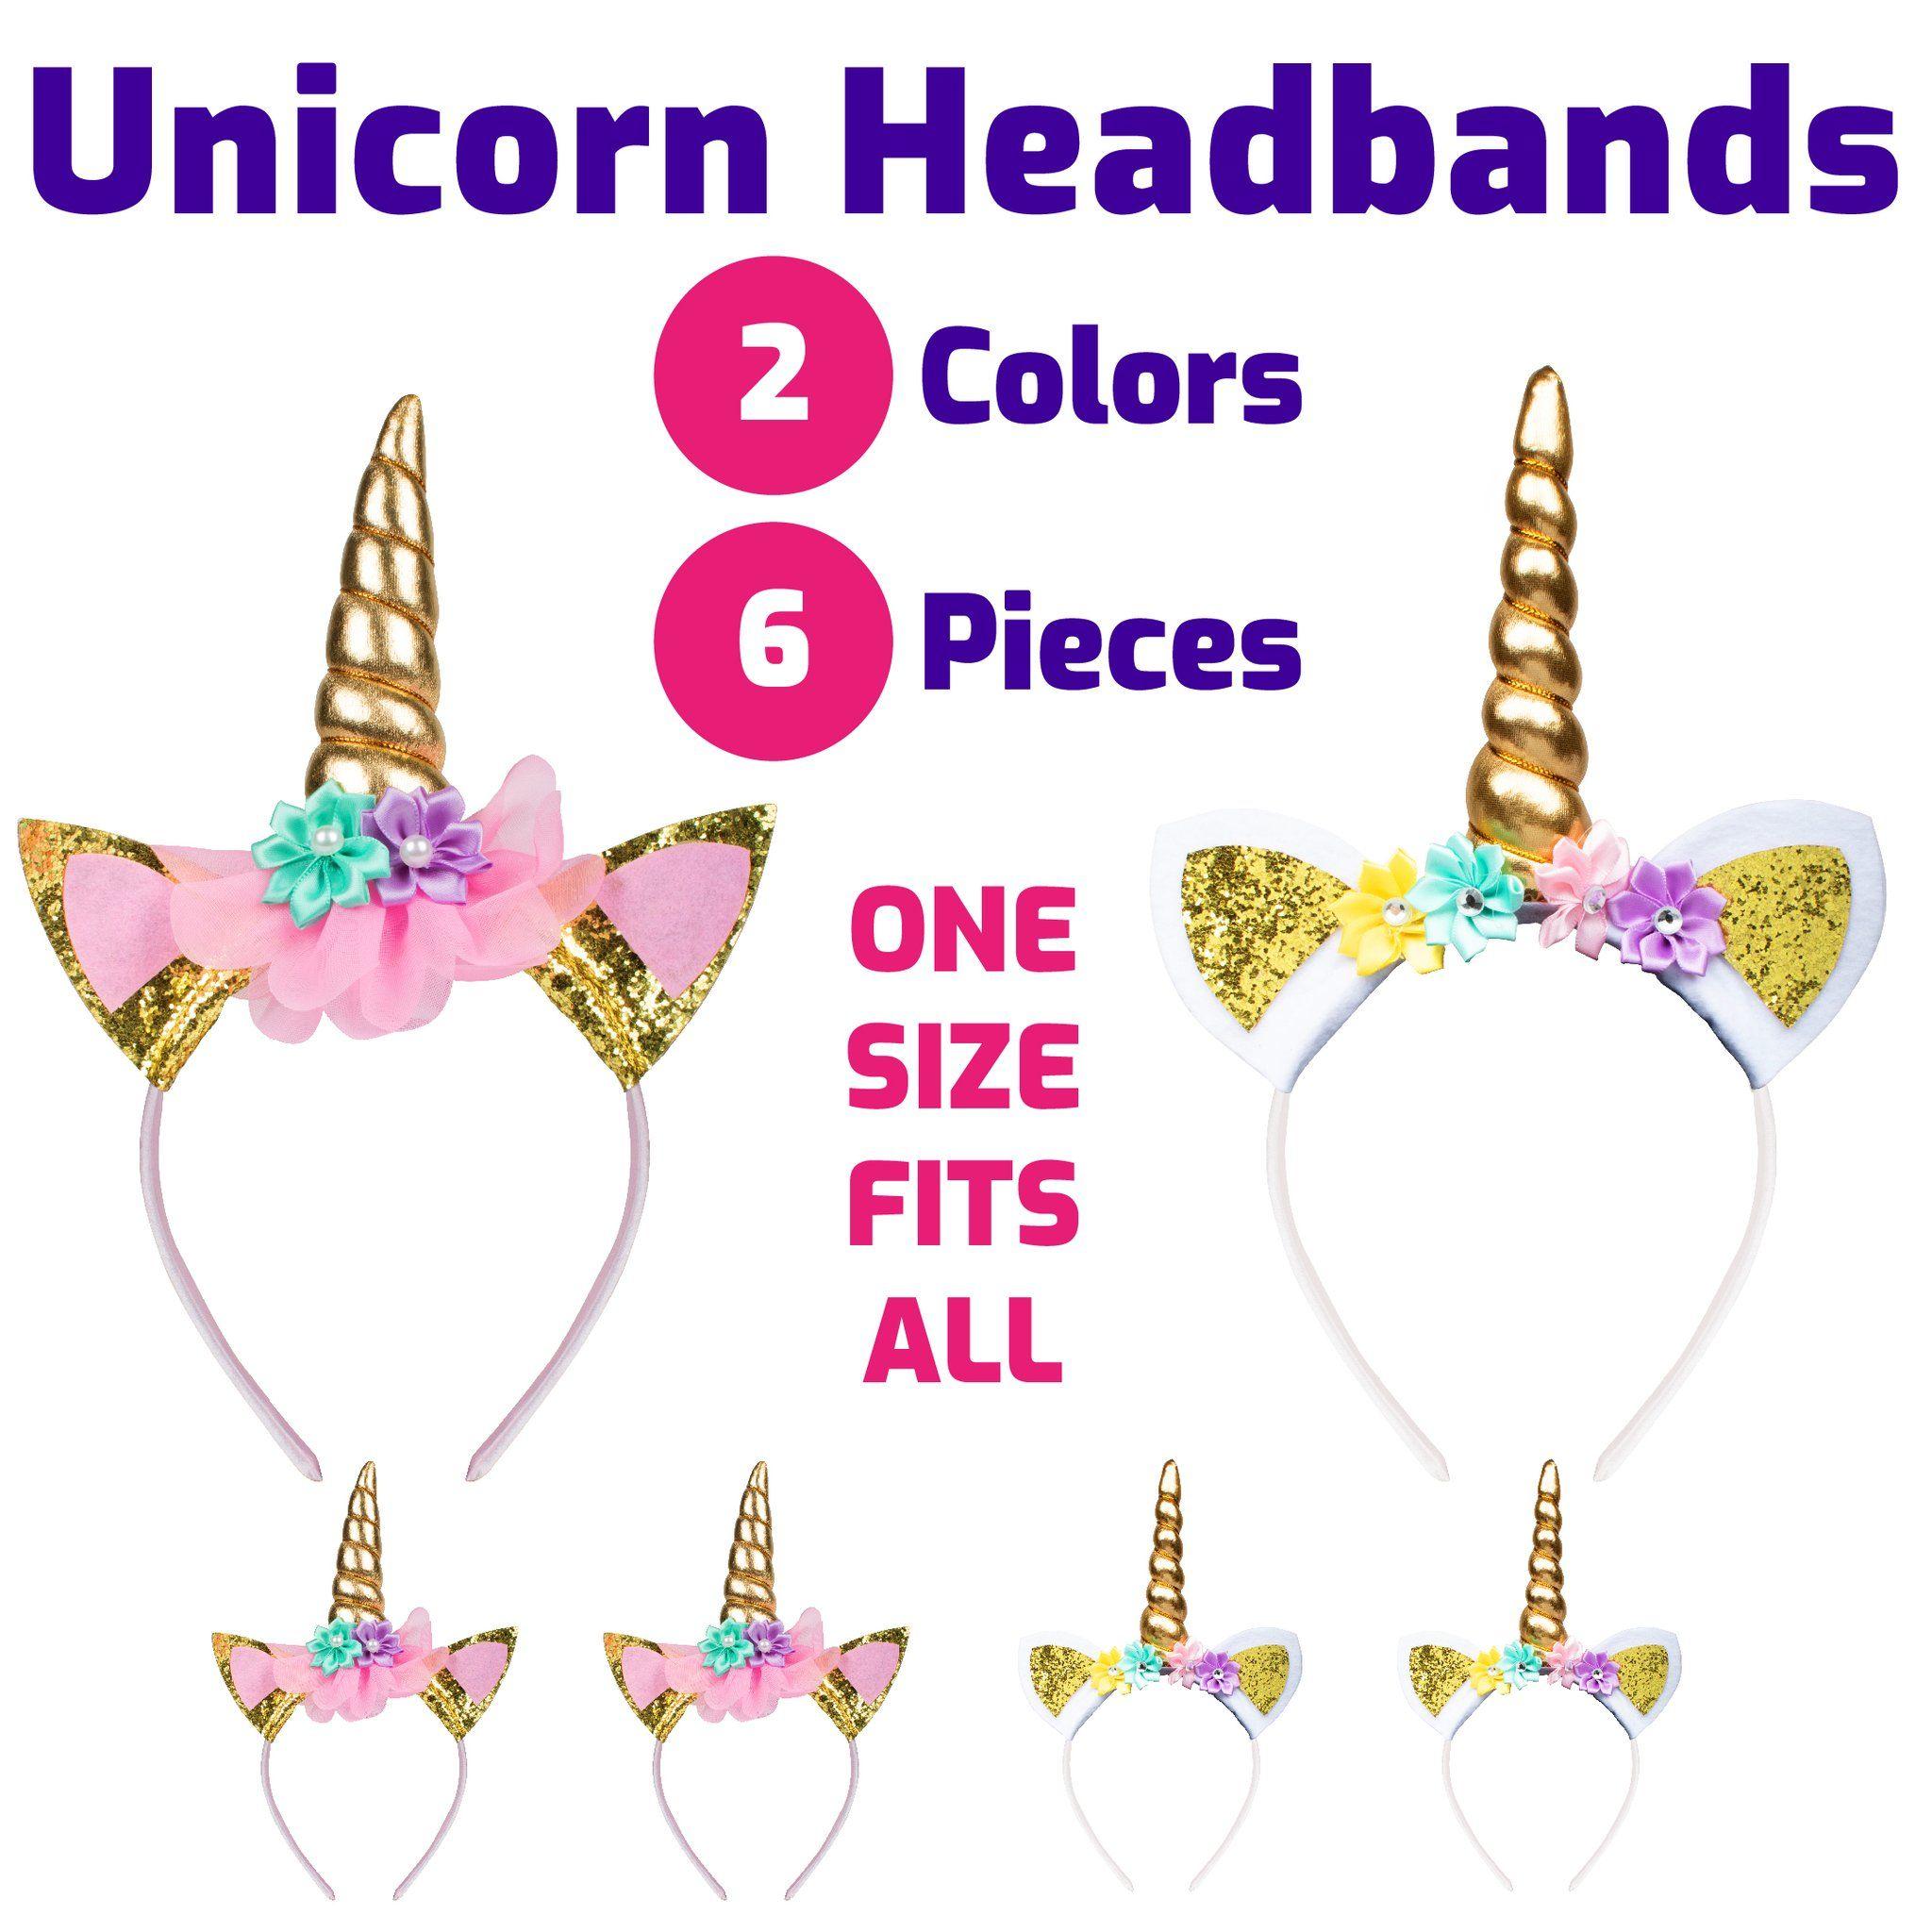 Unicorn Birthday Party Unicorn Costume Unicorn Party Hat Unicorn Party Decorations